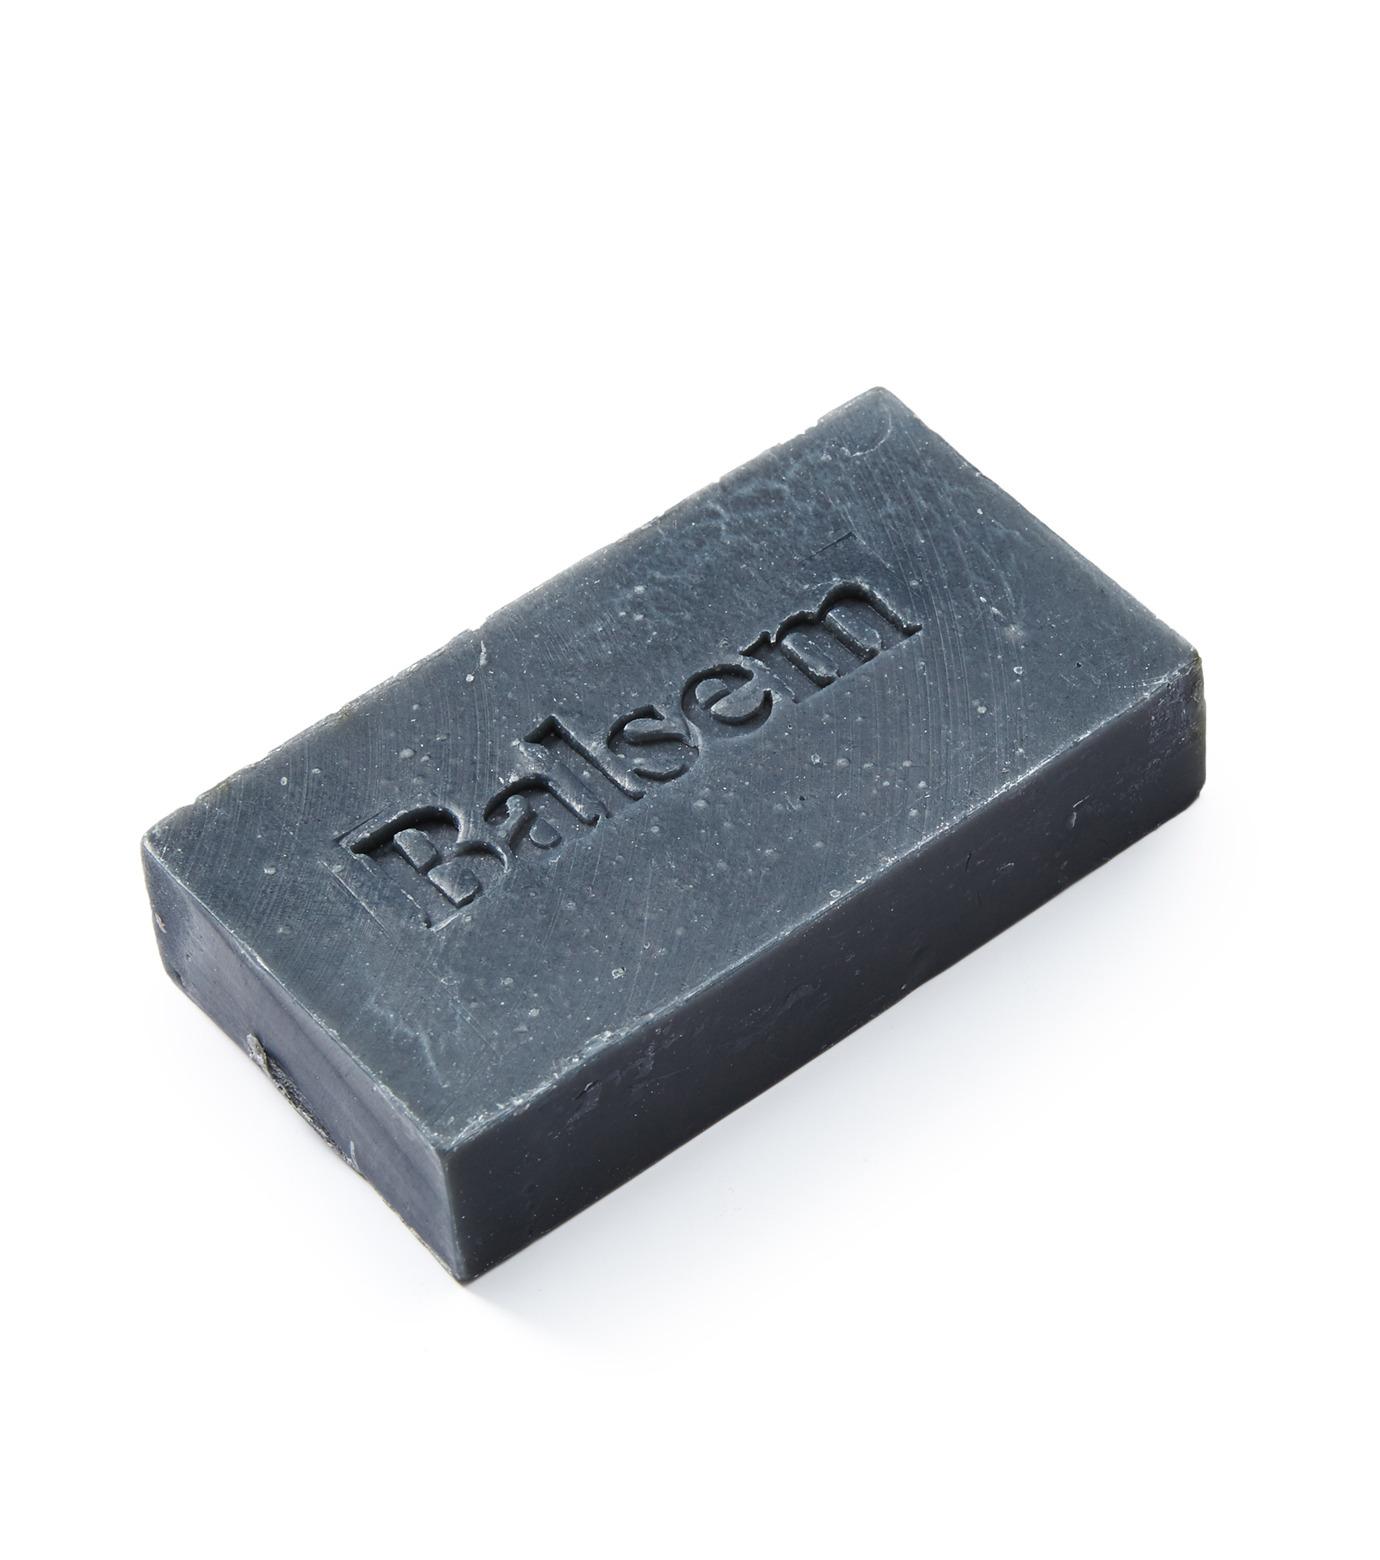 BALSEM()のBAR SOAP C/S 180g-WHITE(BATH-BODY-GROOMING/BATH-BODY-GROOMING)-MS-31031B-4 拡大詳細画像1